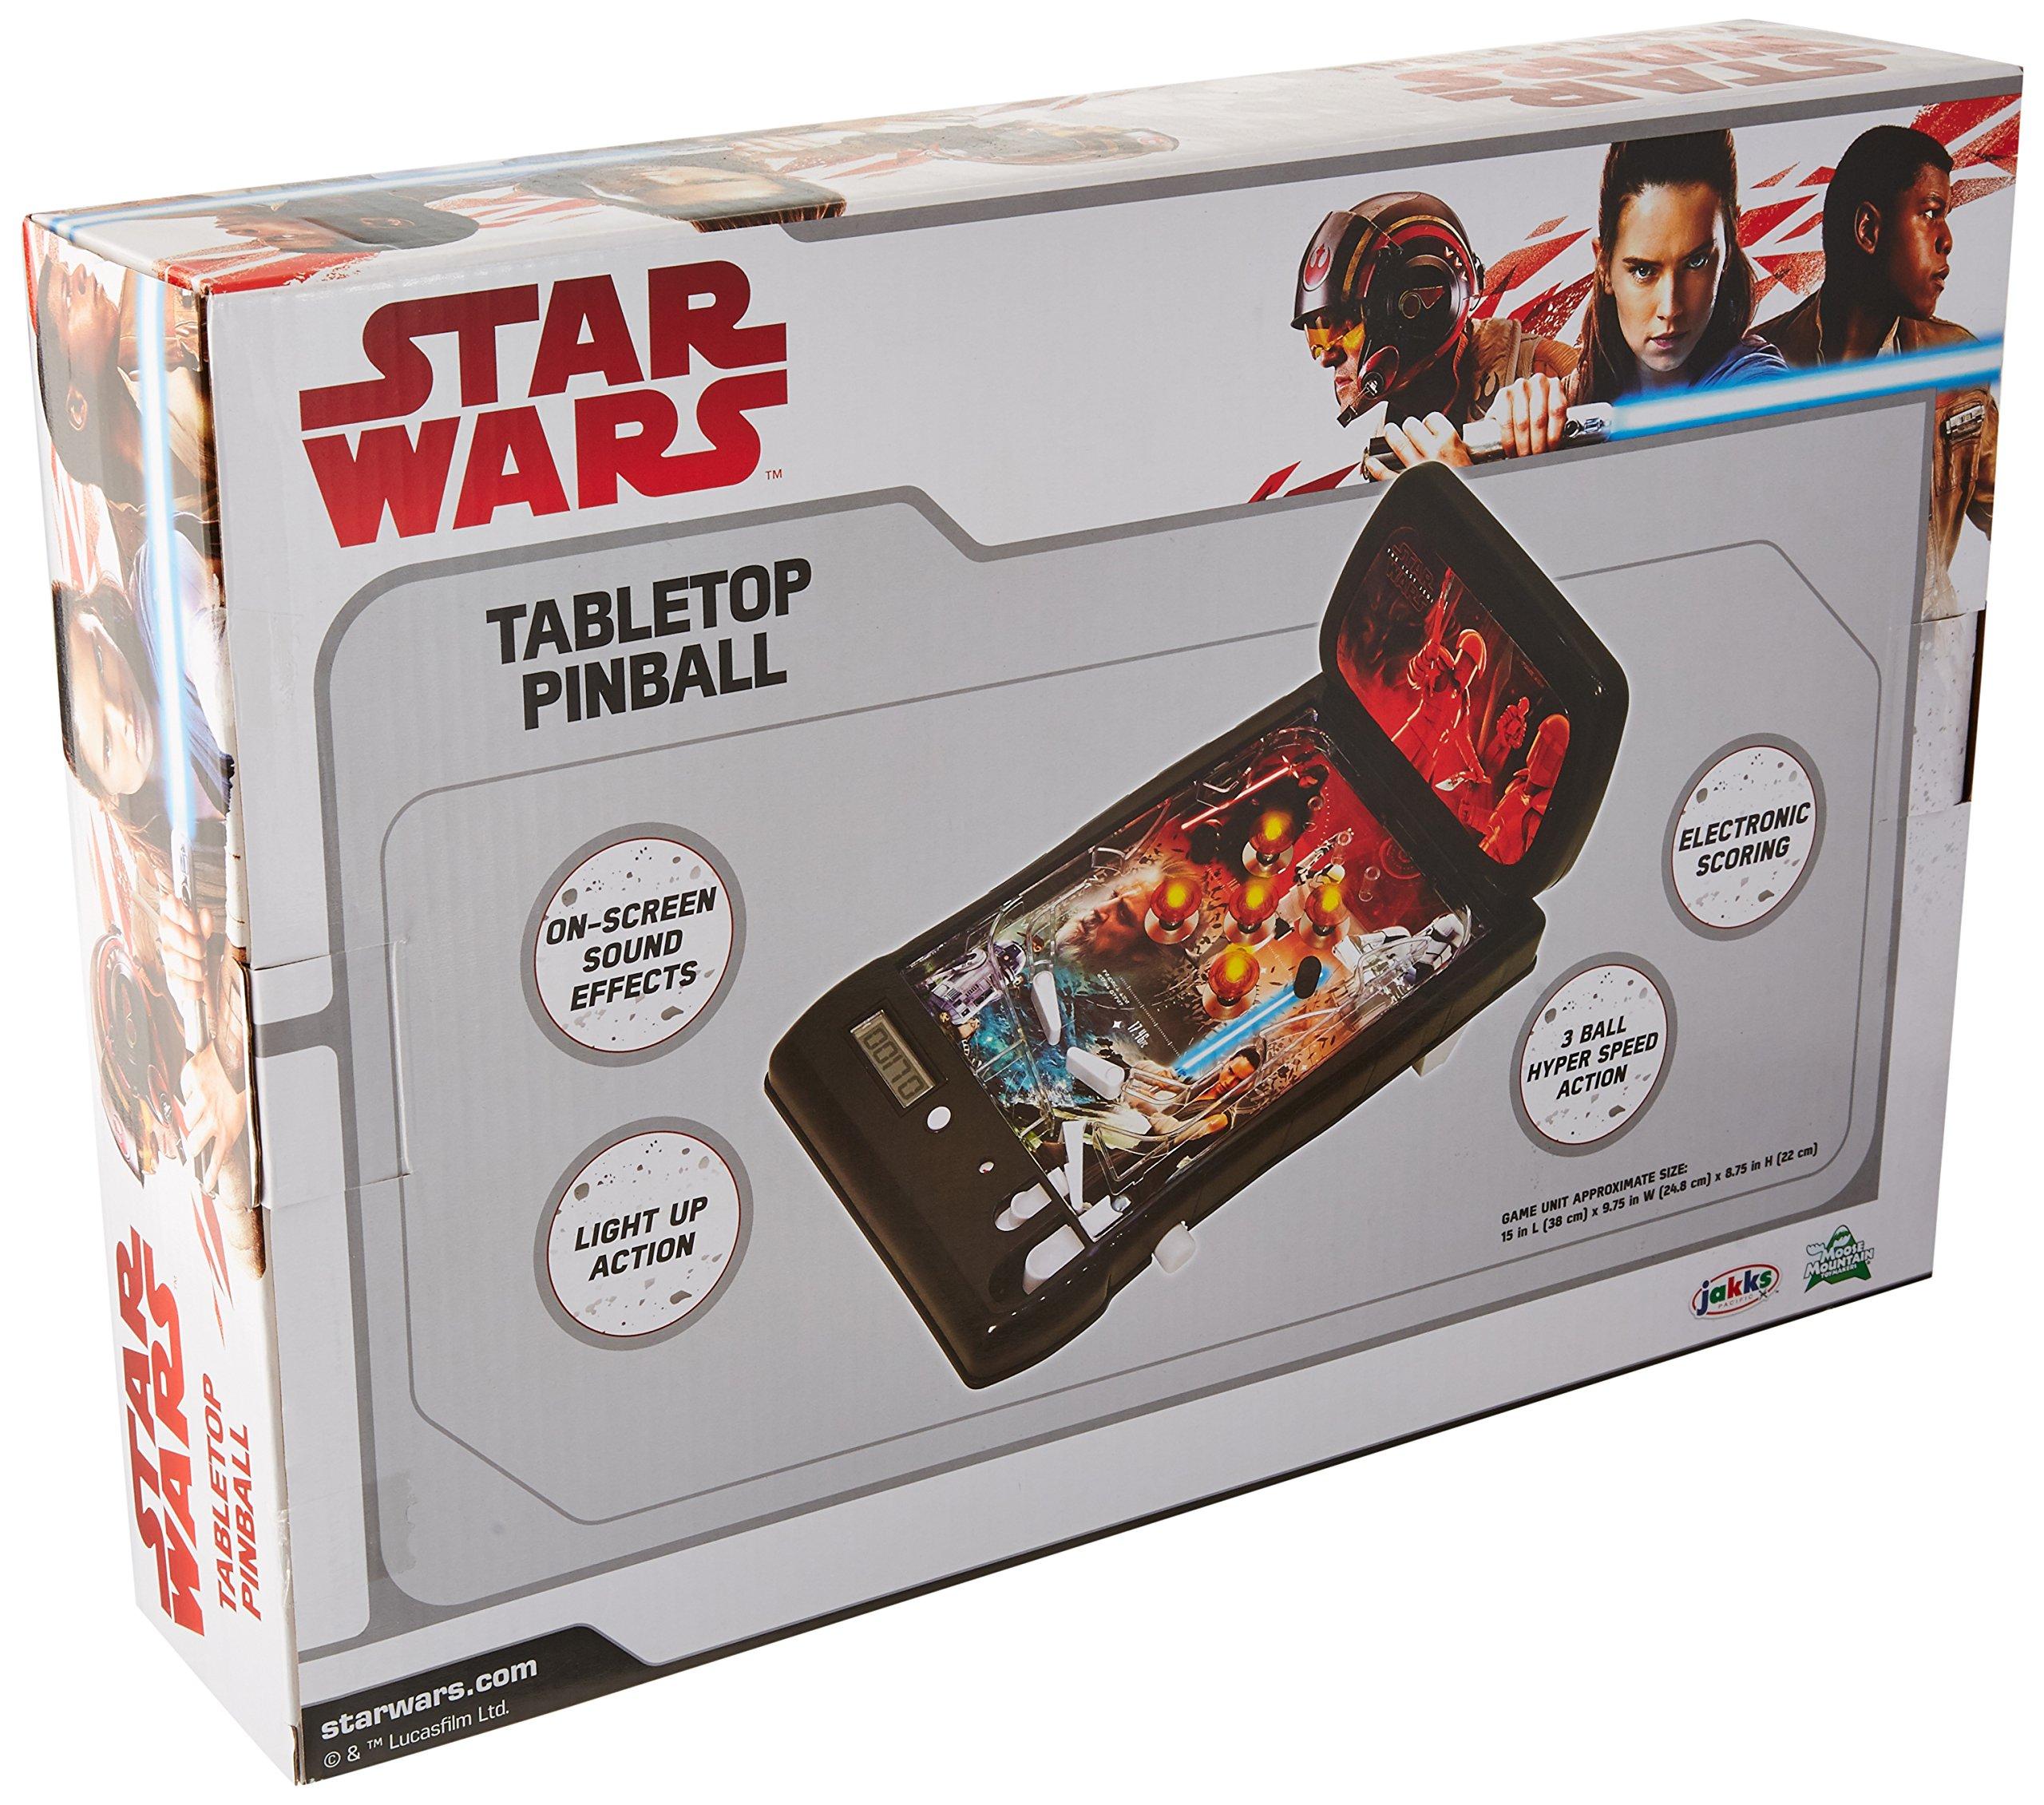 Star Wars The Last Jedi Tabletop Pinball by Star Wars (Image #2)